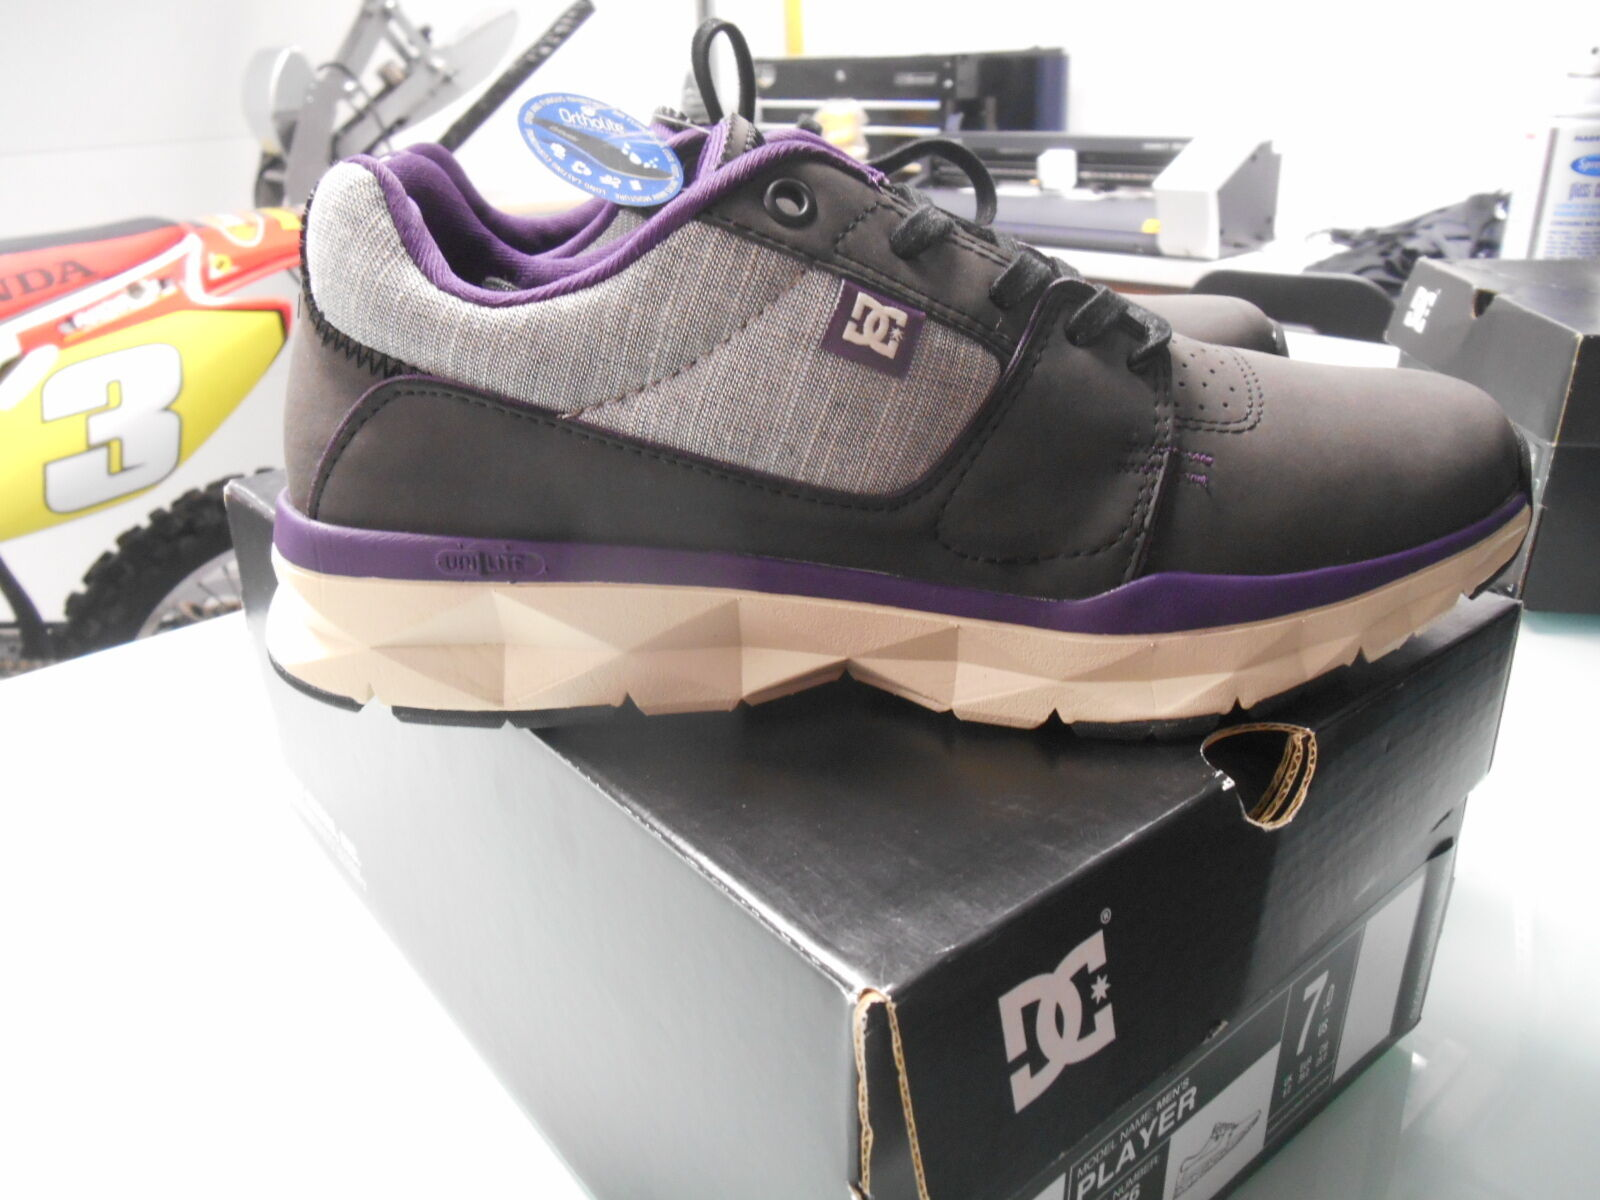 DC PLAYER zapatos UNILITE negro púrpura ATHLETE ATHLETIC COMFORTABLE zapatos SZ 7 US